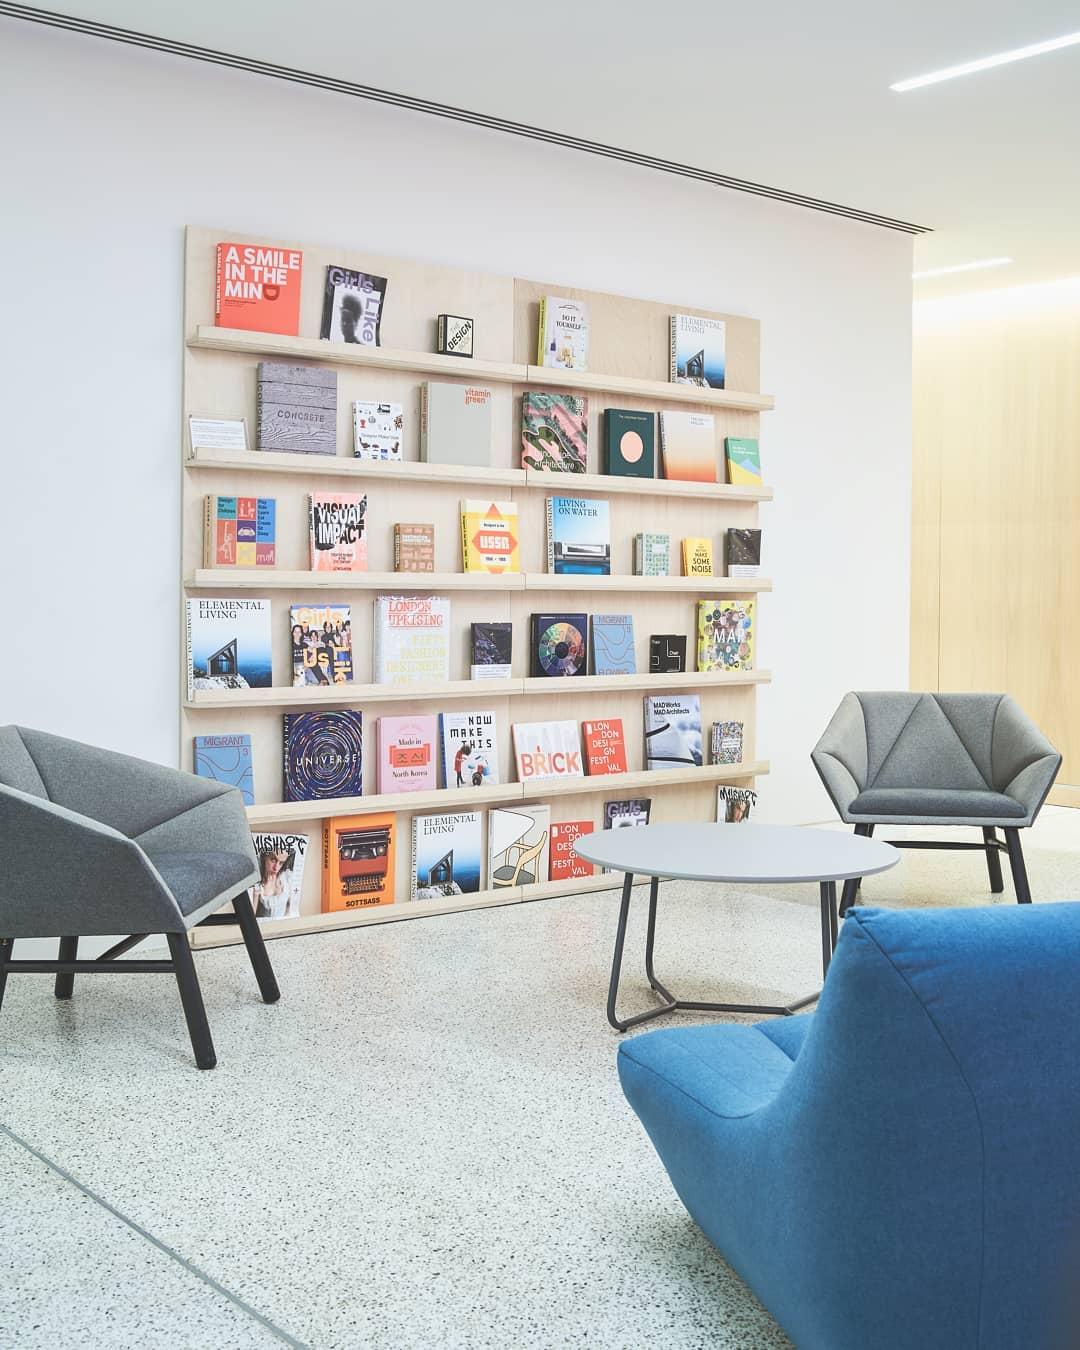 BDOTY kensington london minimalism designmuseum interiordesign